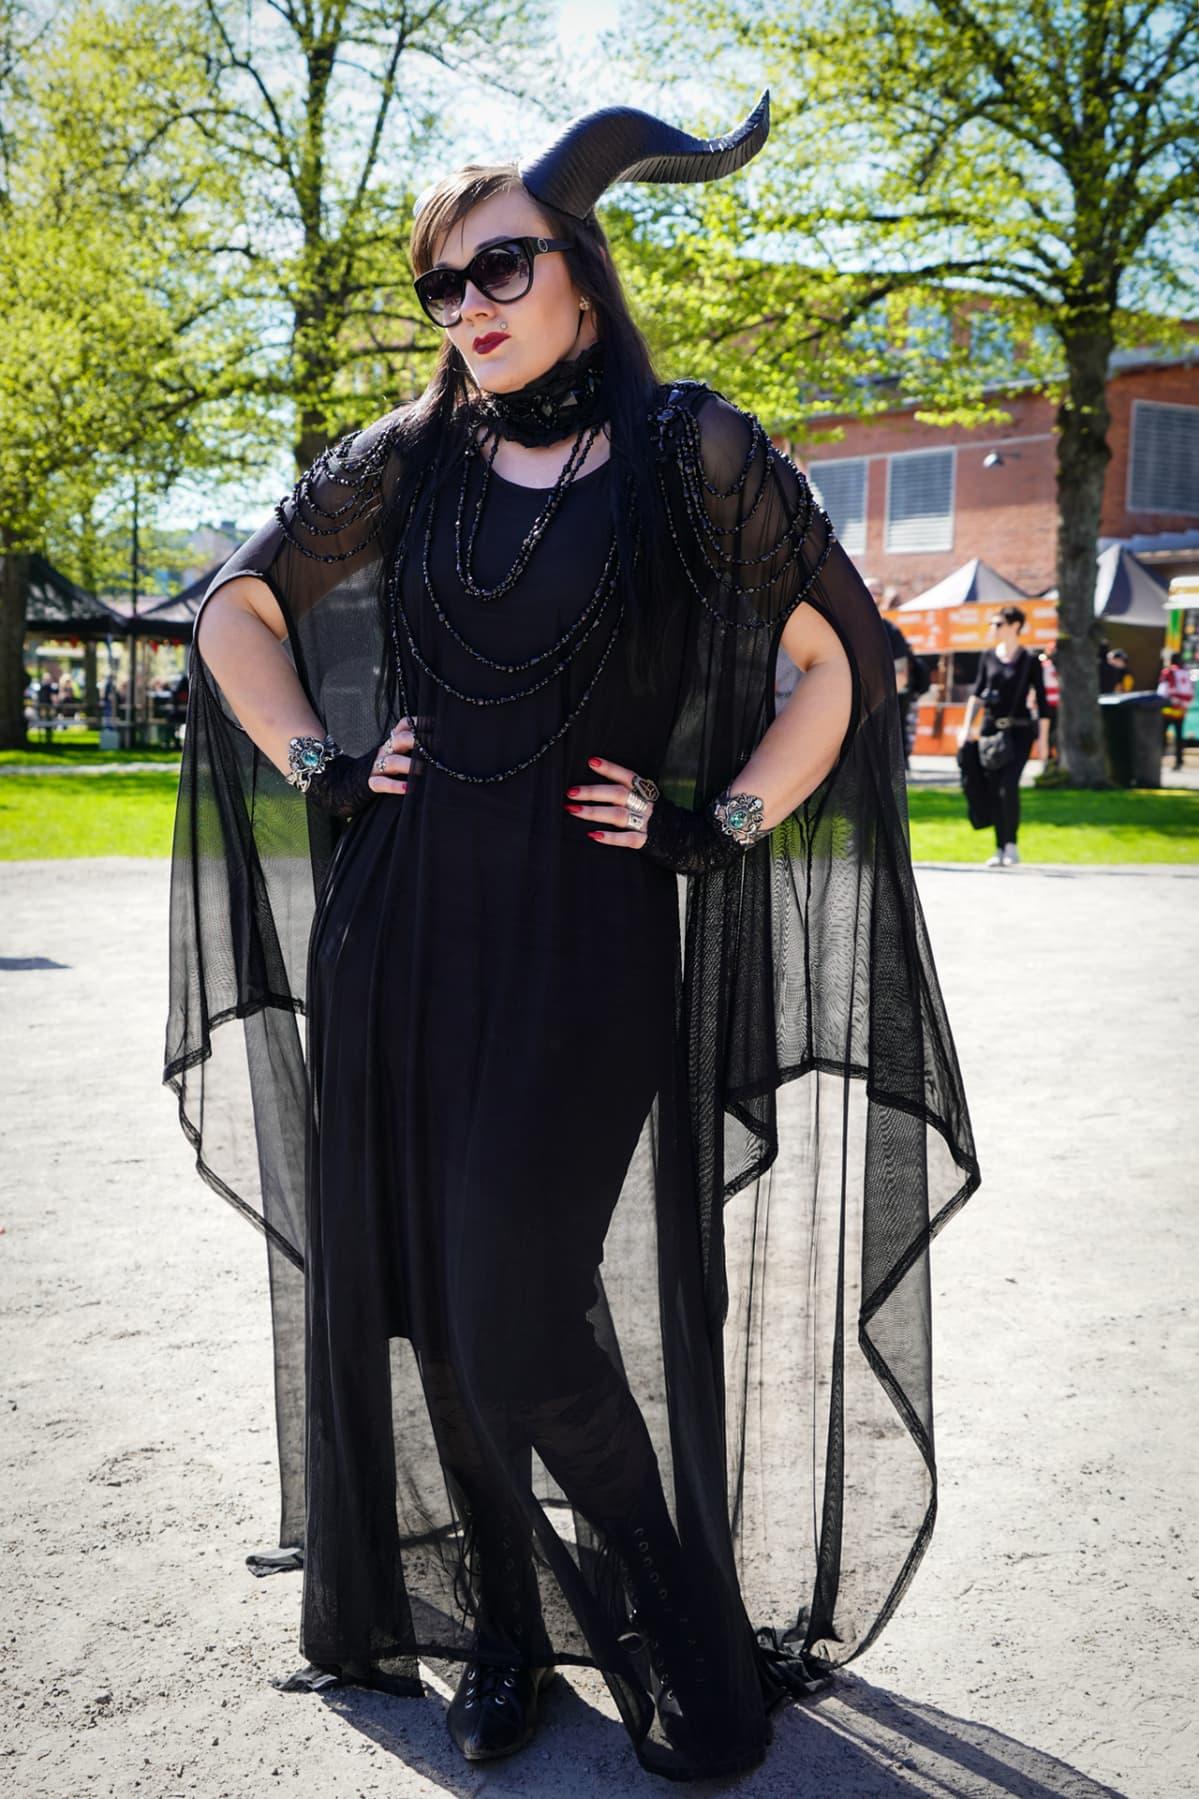 Marjo Laine, Steelfest, black metal